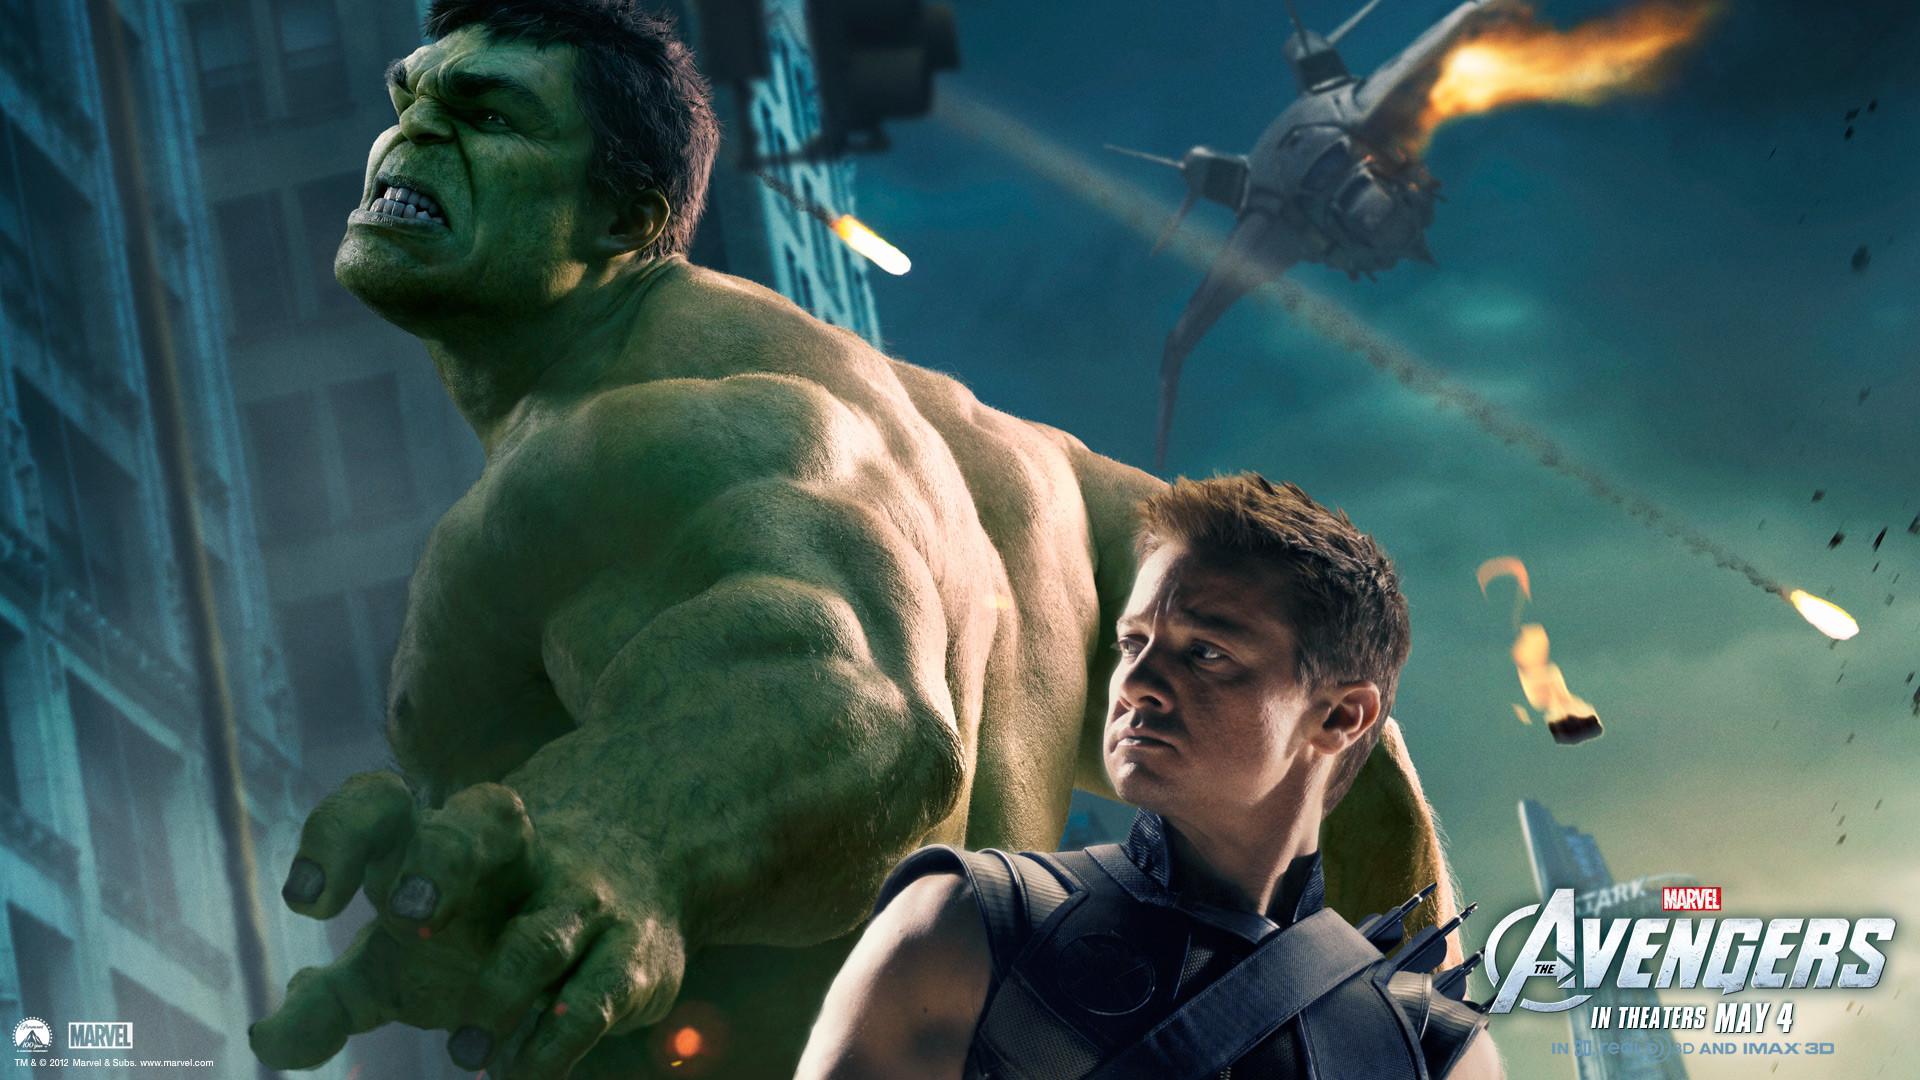 Marvel-The-Avengers-Movie-2012-HD-Wallpaper-The-